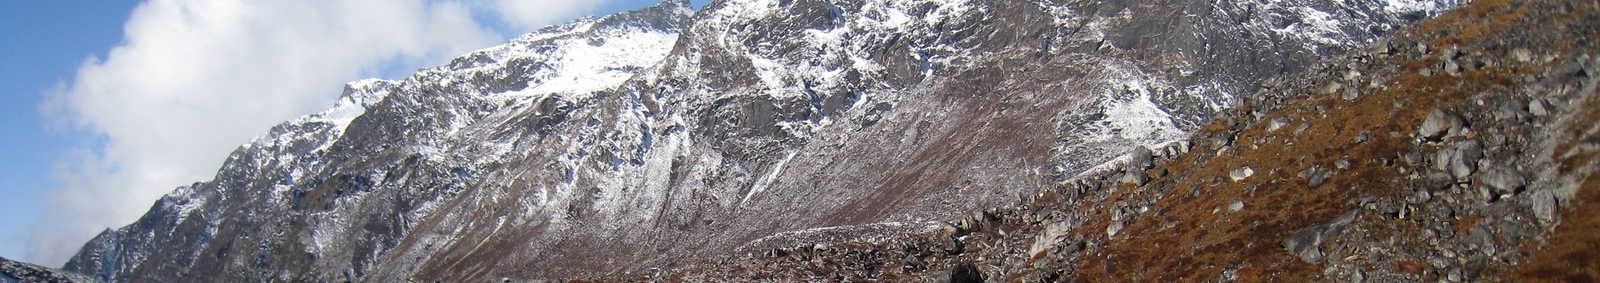 Samiti Lake and mountains, Sikkim Kanchenjunga trek, India